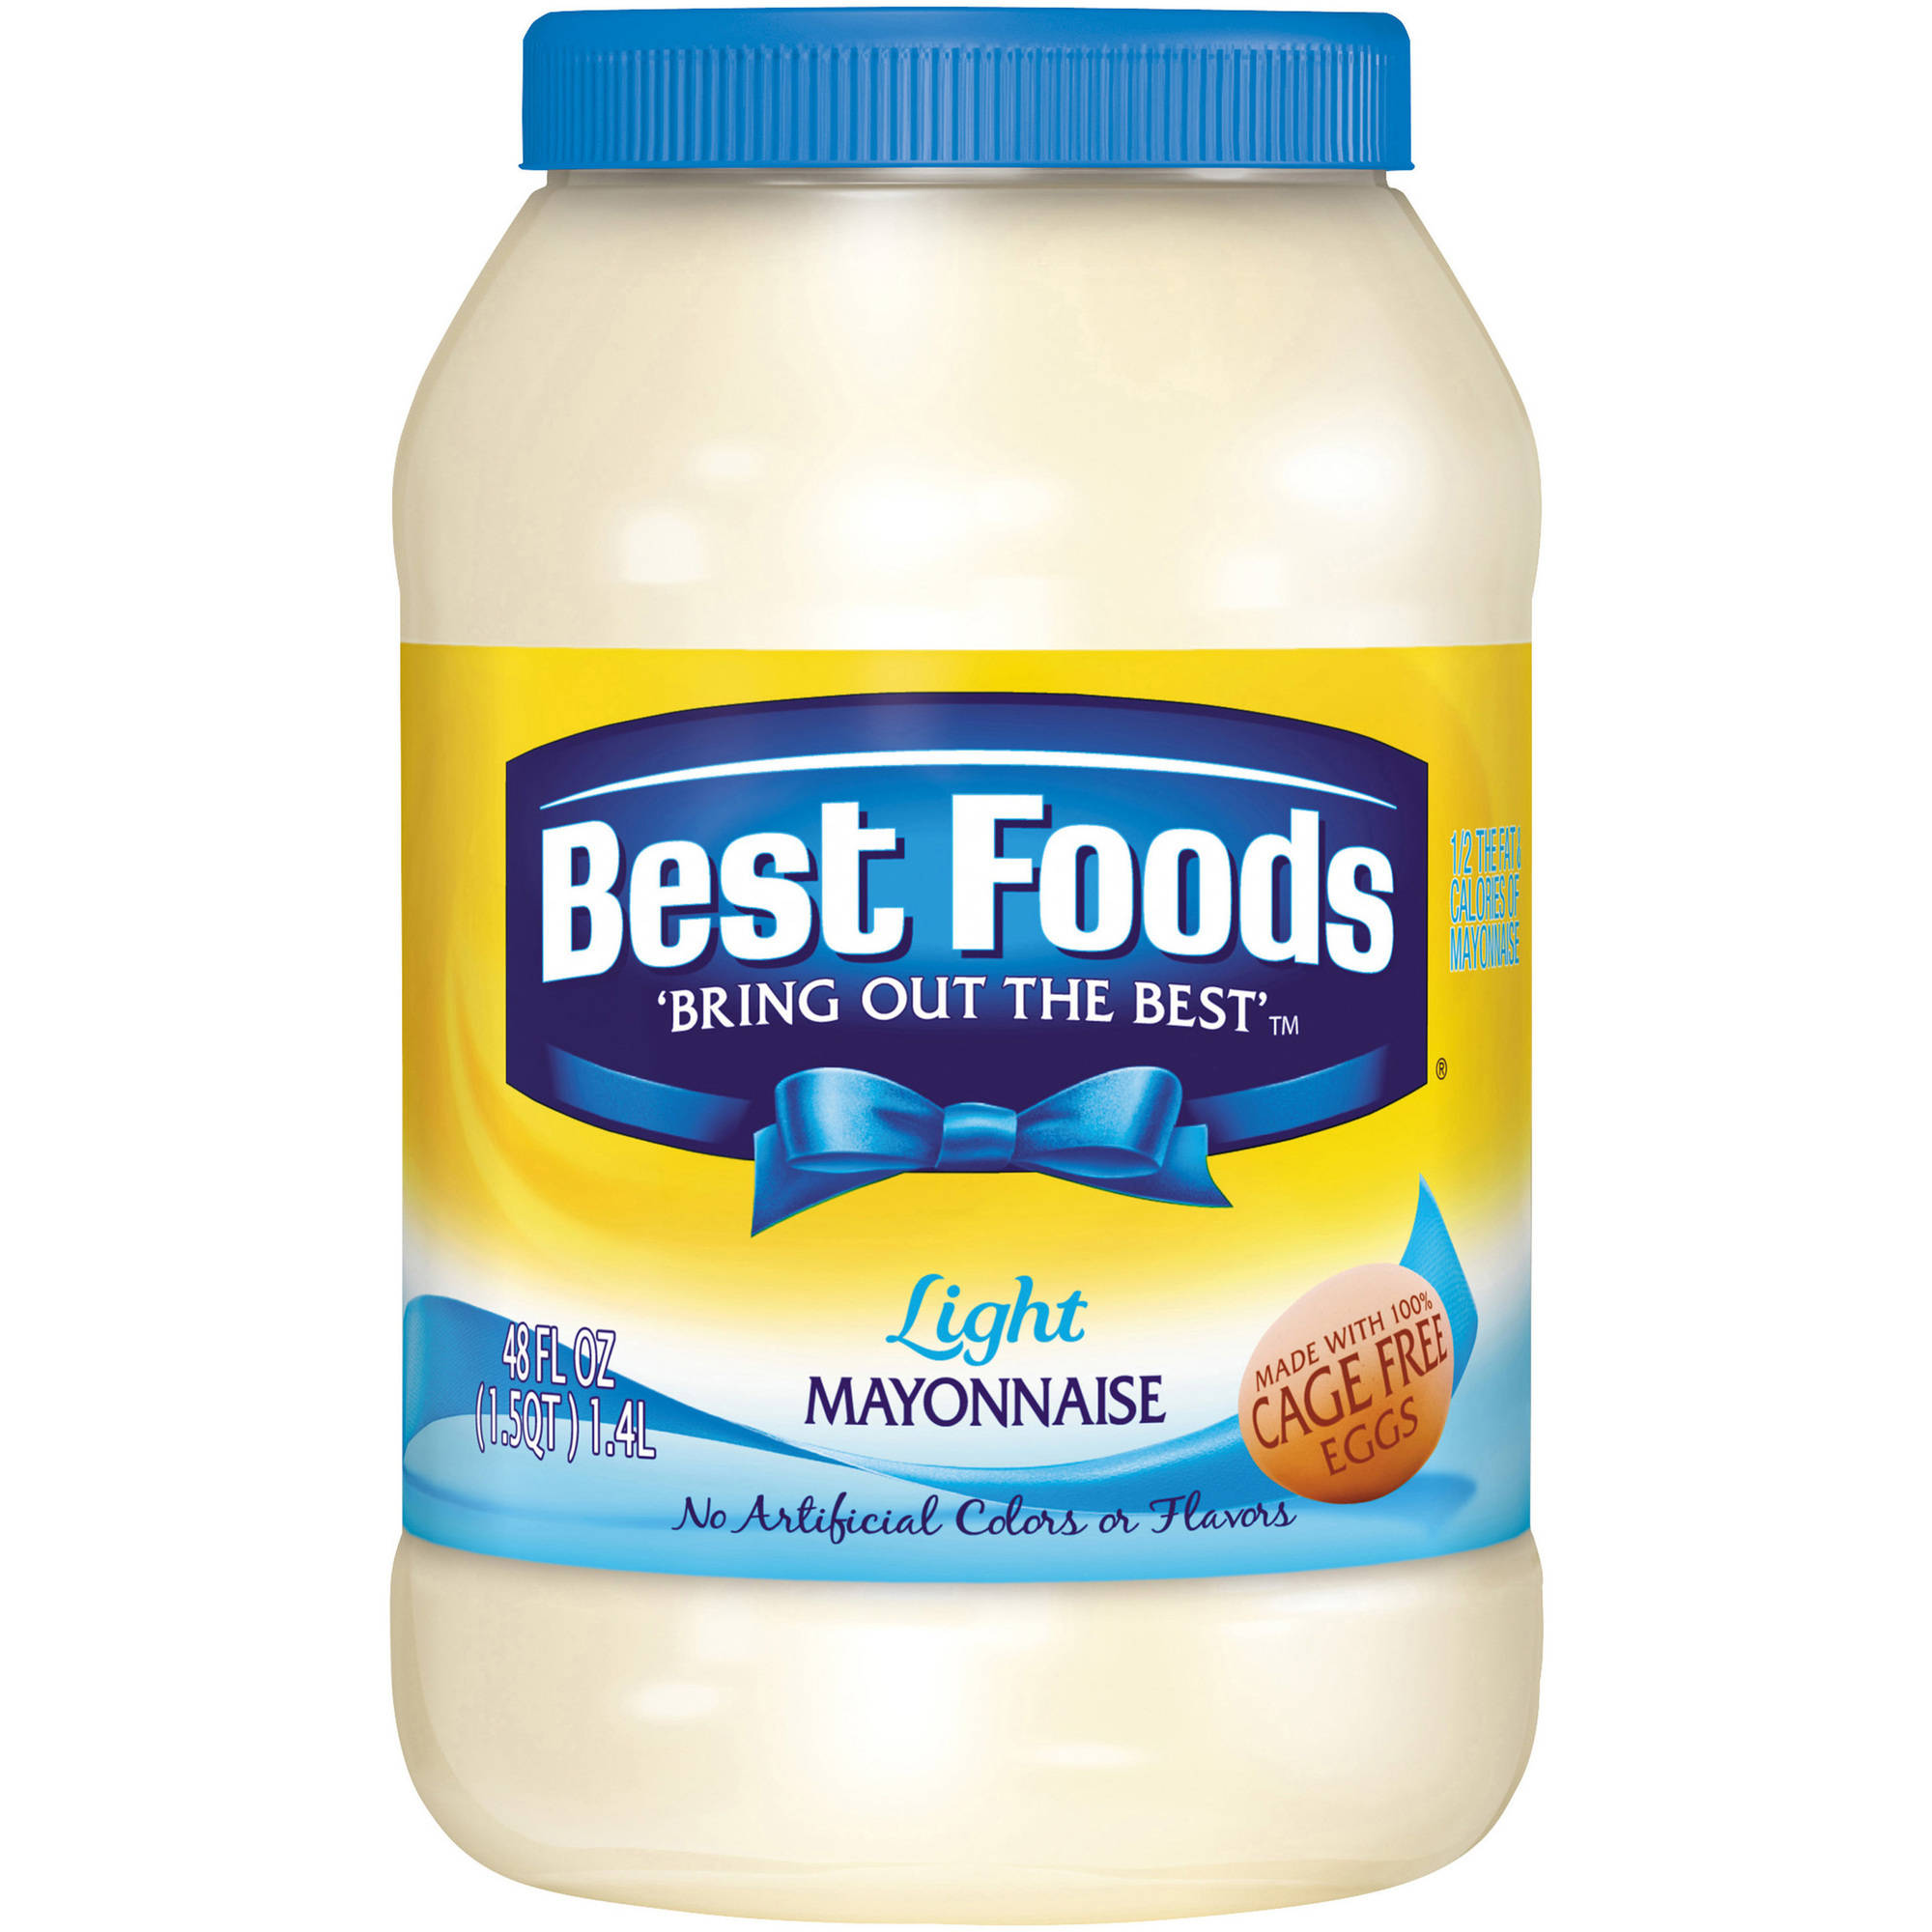 Best Foods Light Mayonnaise, 48 fl oz